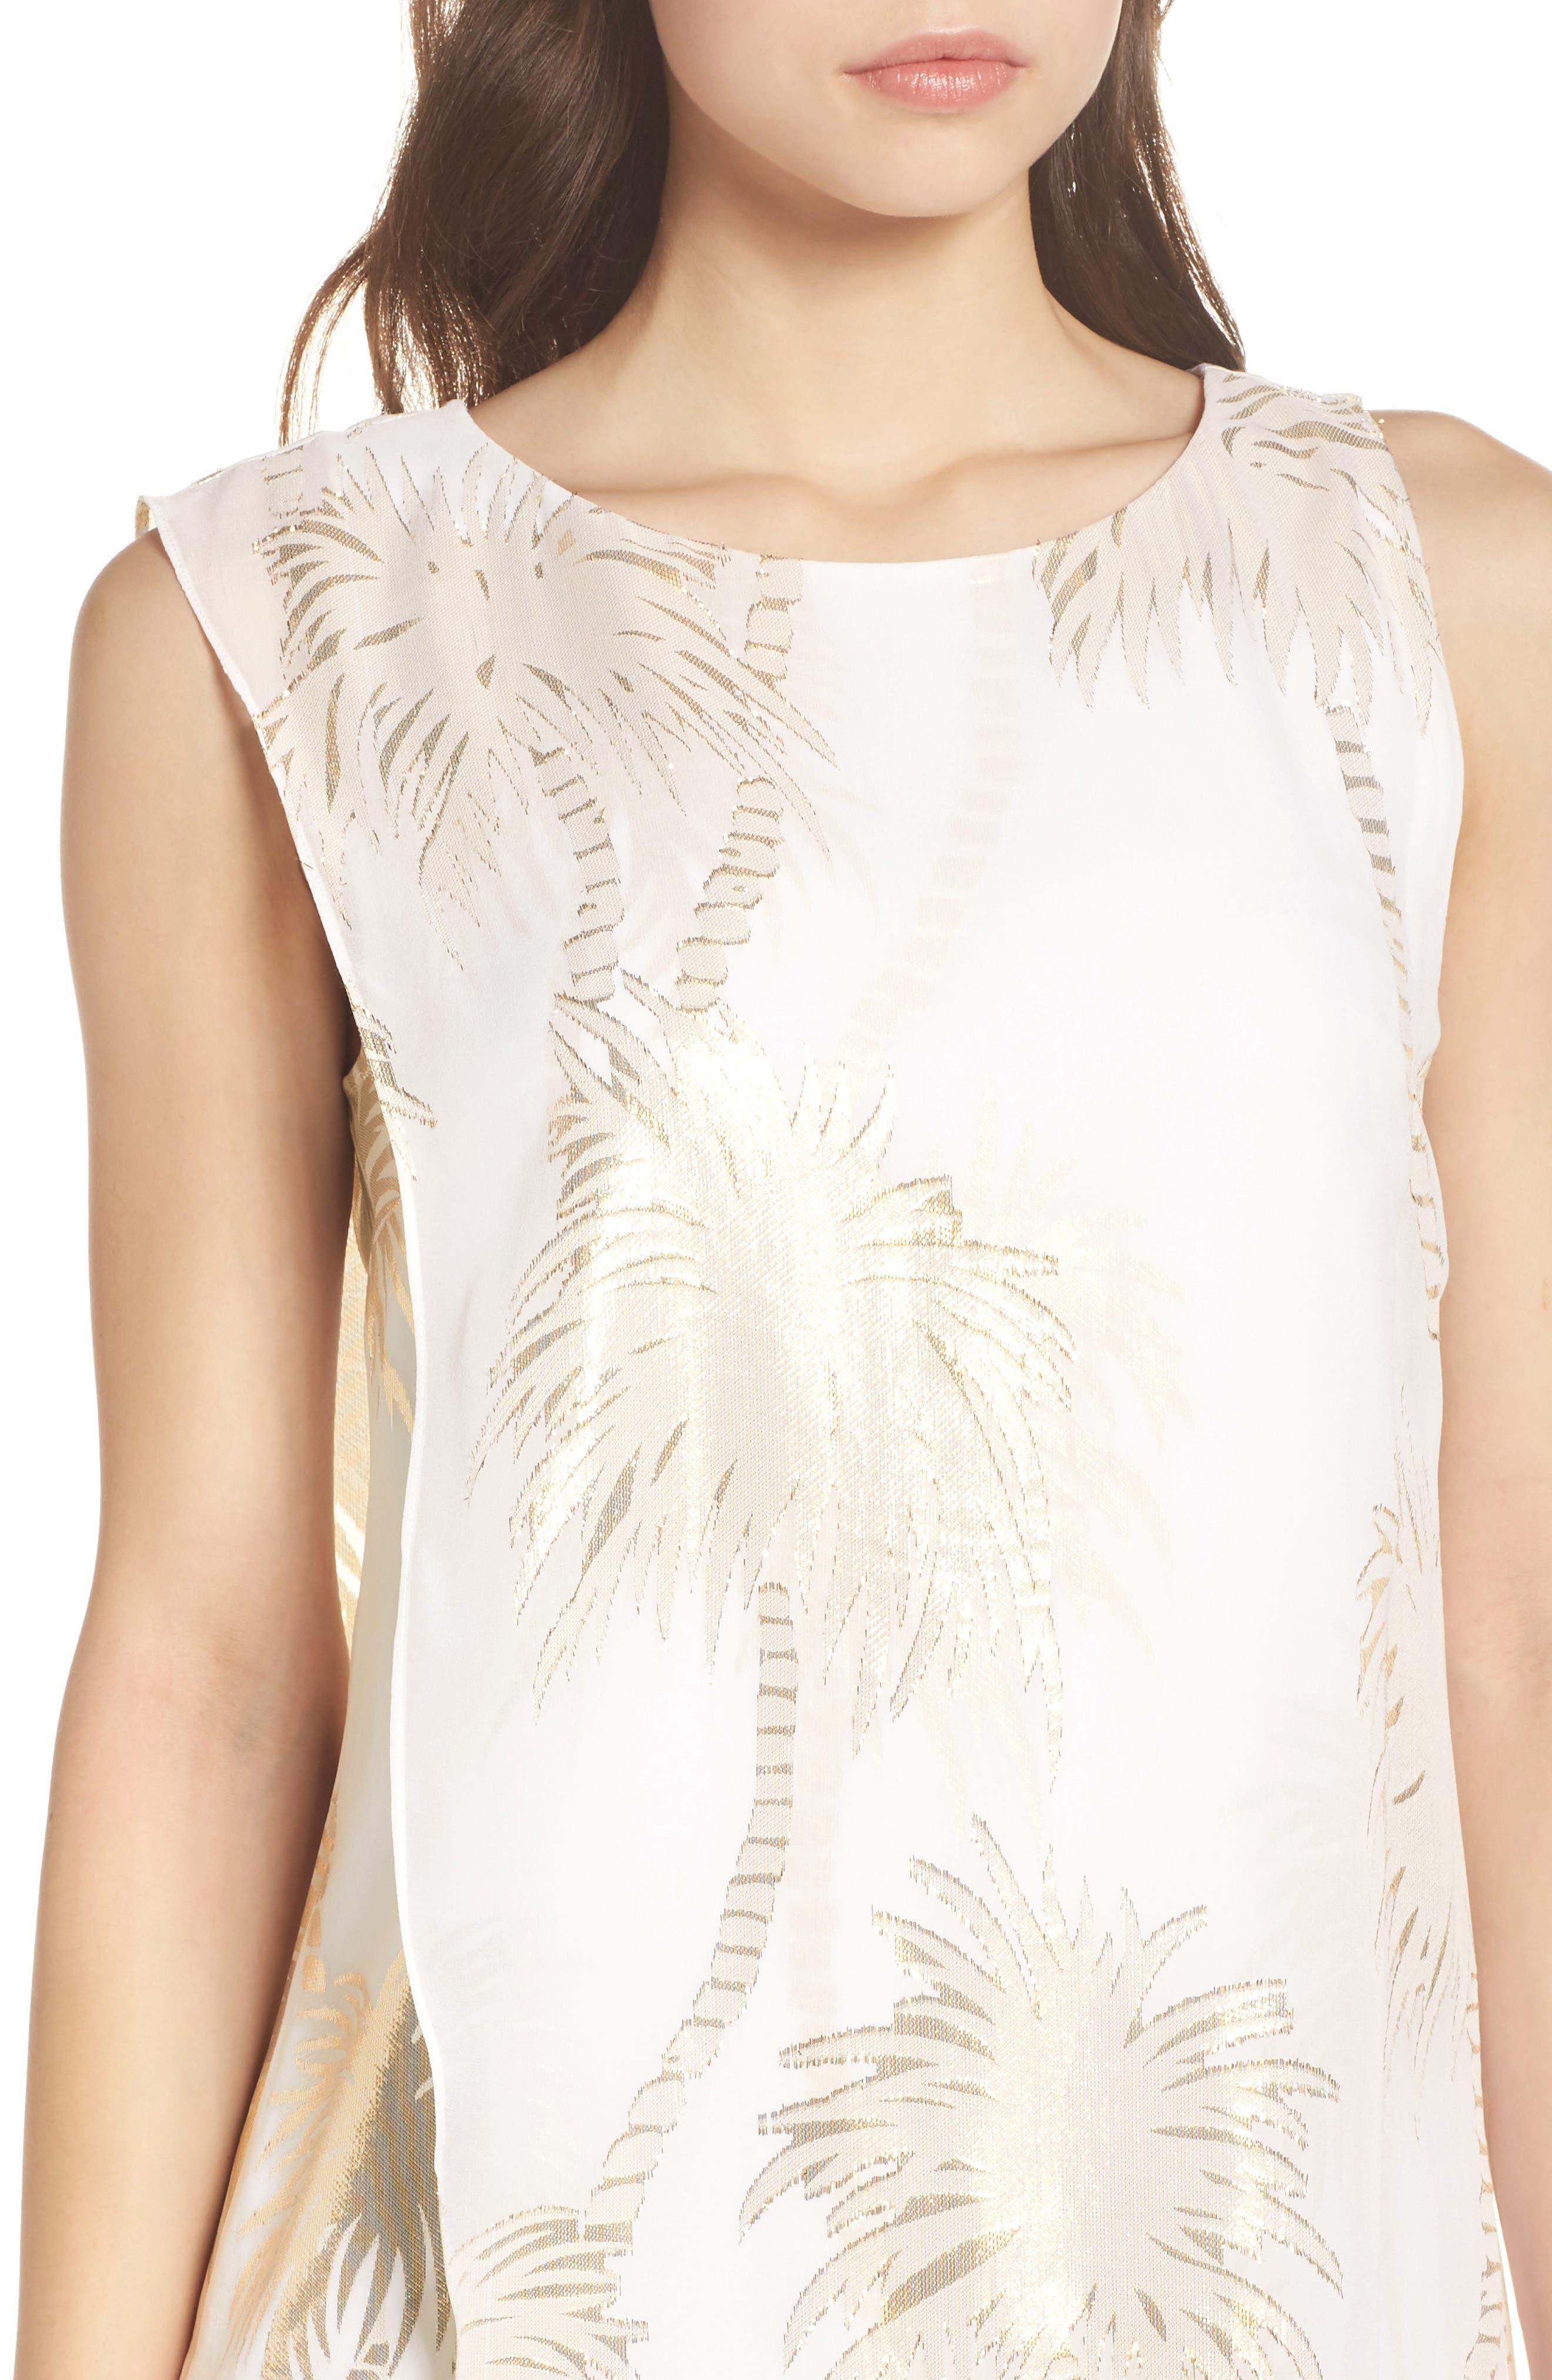 Calissa Silk Dress,                             Alternate thumbnail 4, color,                             Resort White Palm Tree Clip